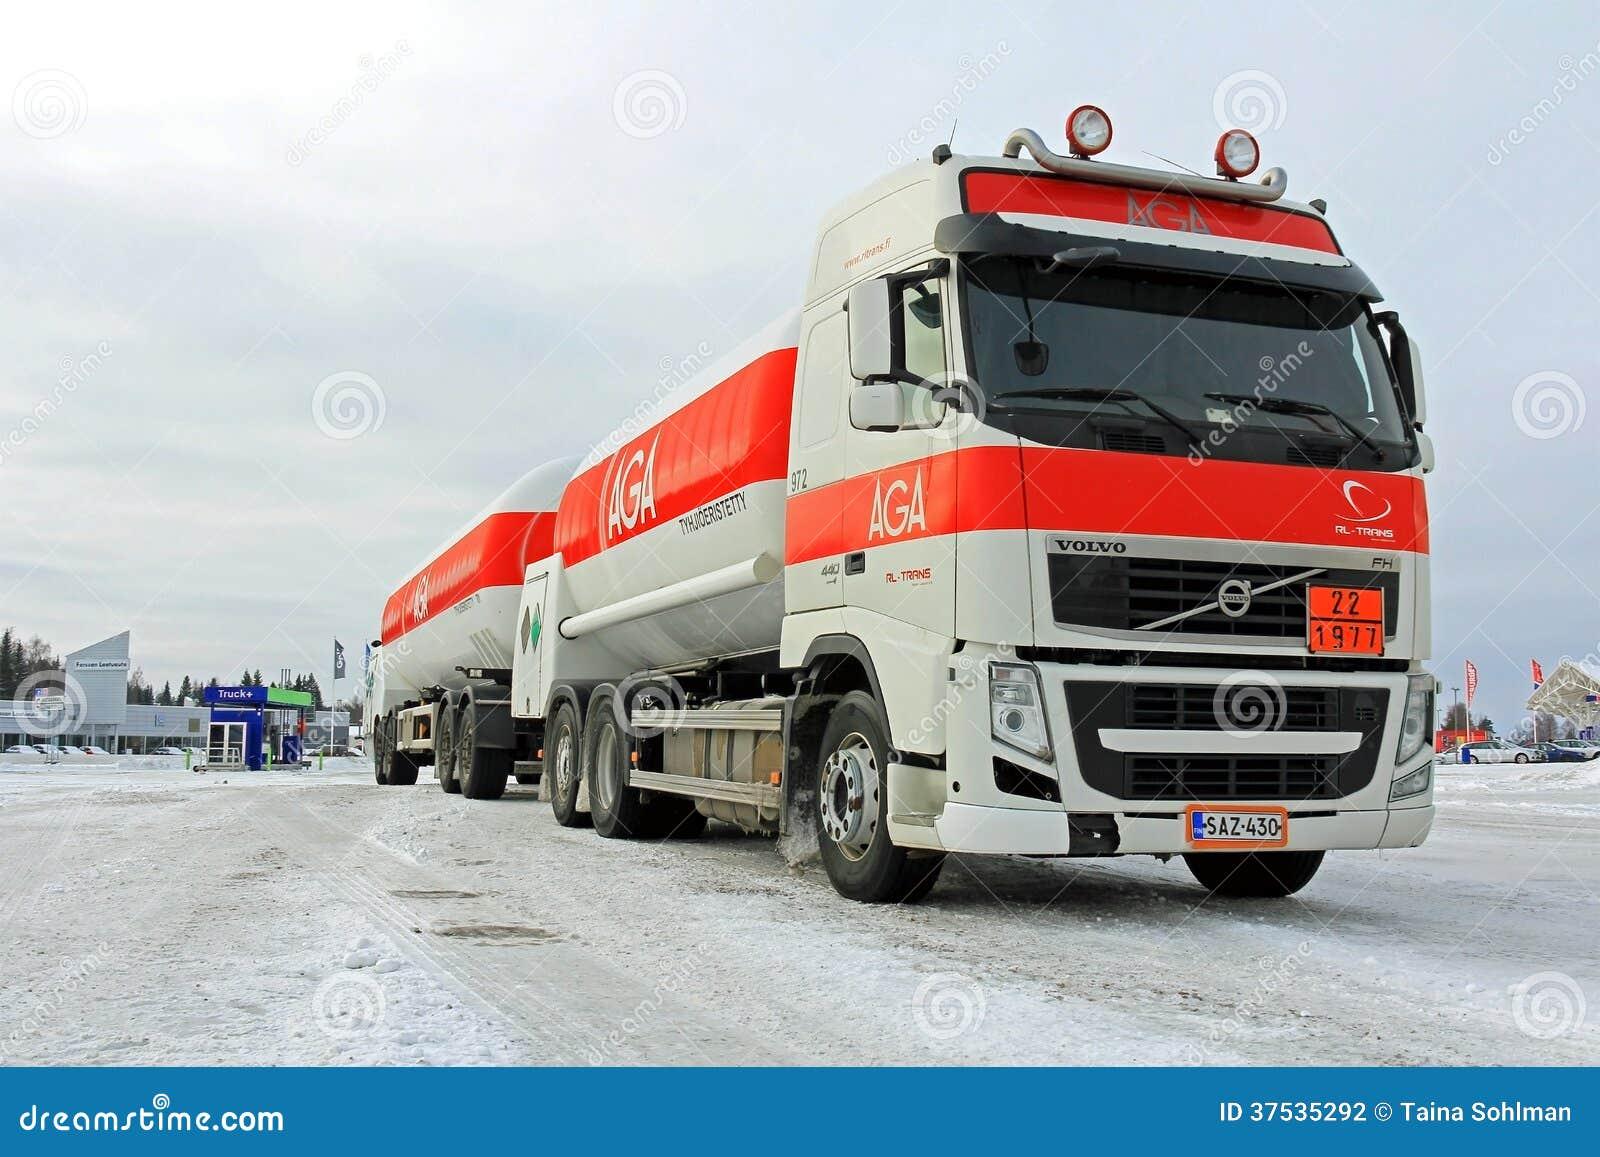 camion citerne aspirateur de gaz de volvo fh aga photographie ditorial image 37535292. Black Bedroom Furniture Sets. Home Design Ideas